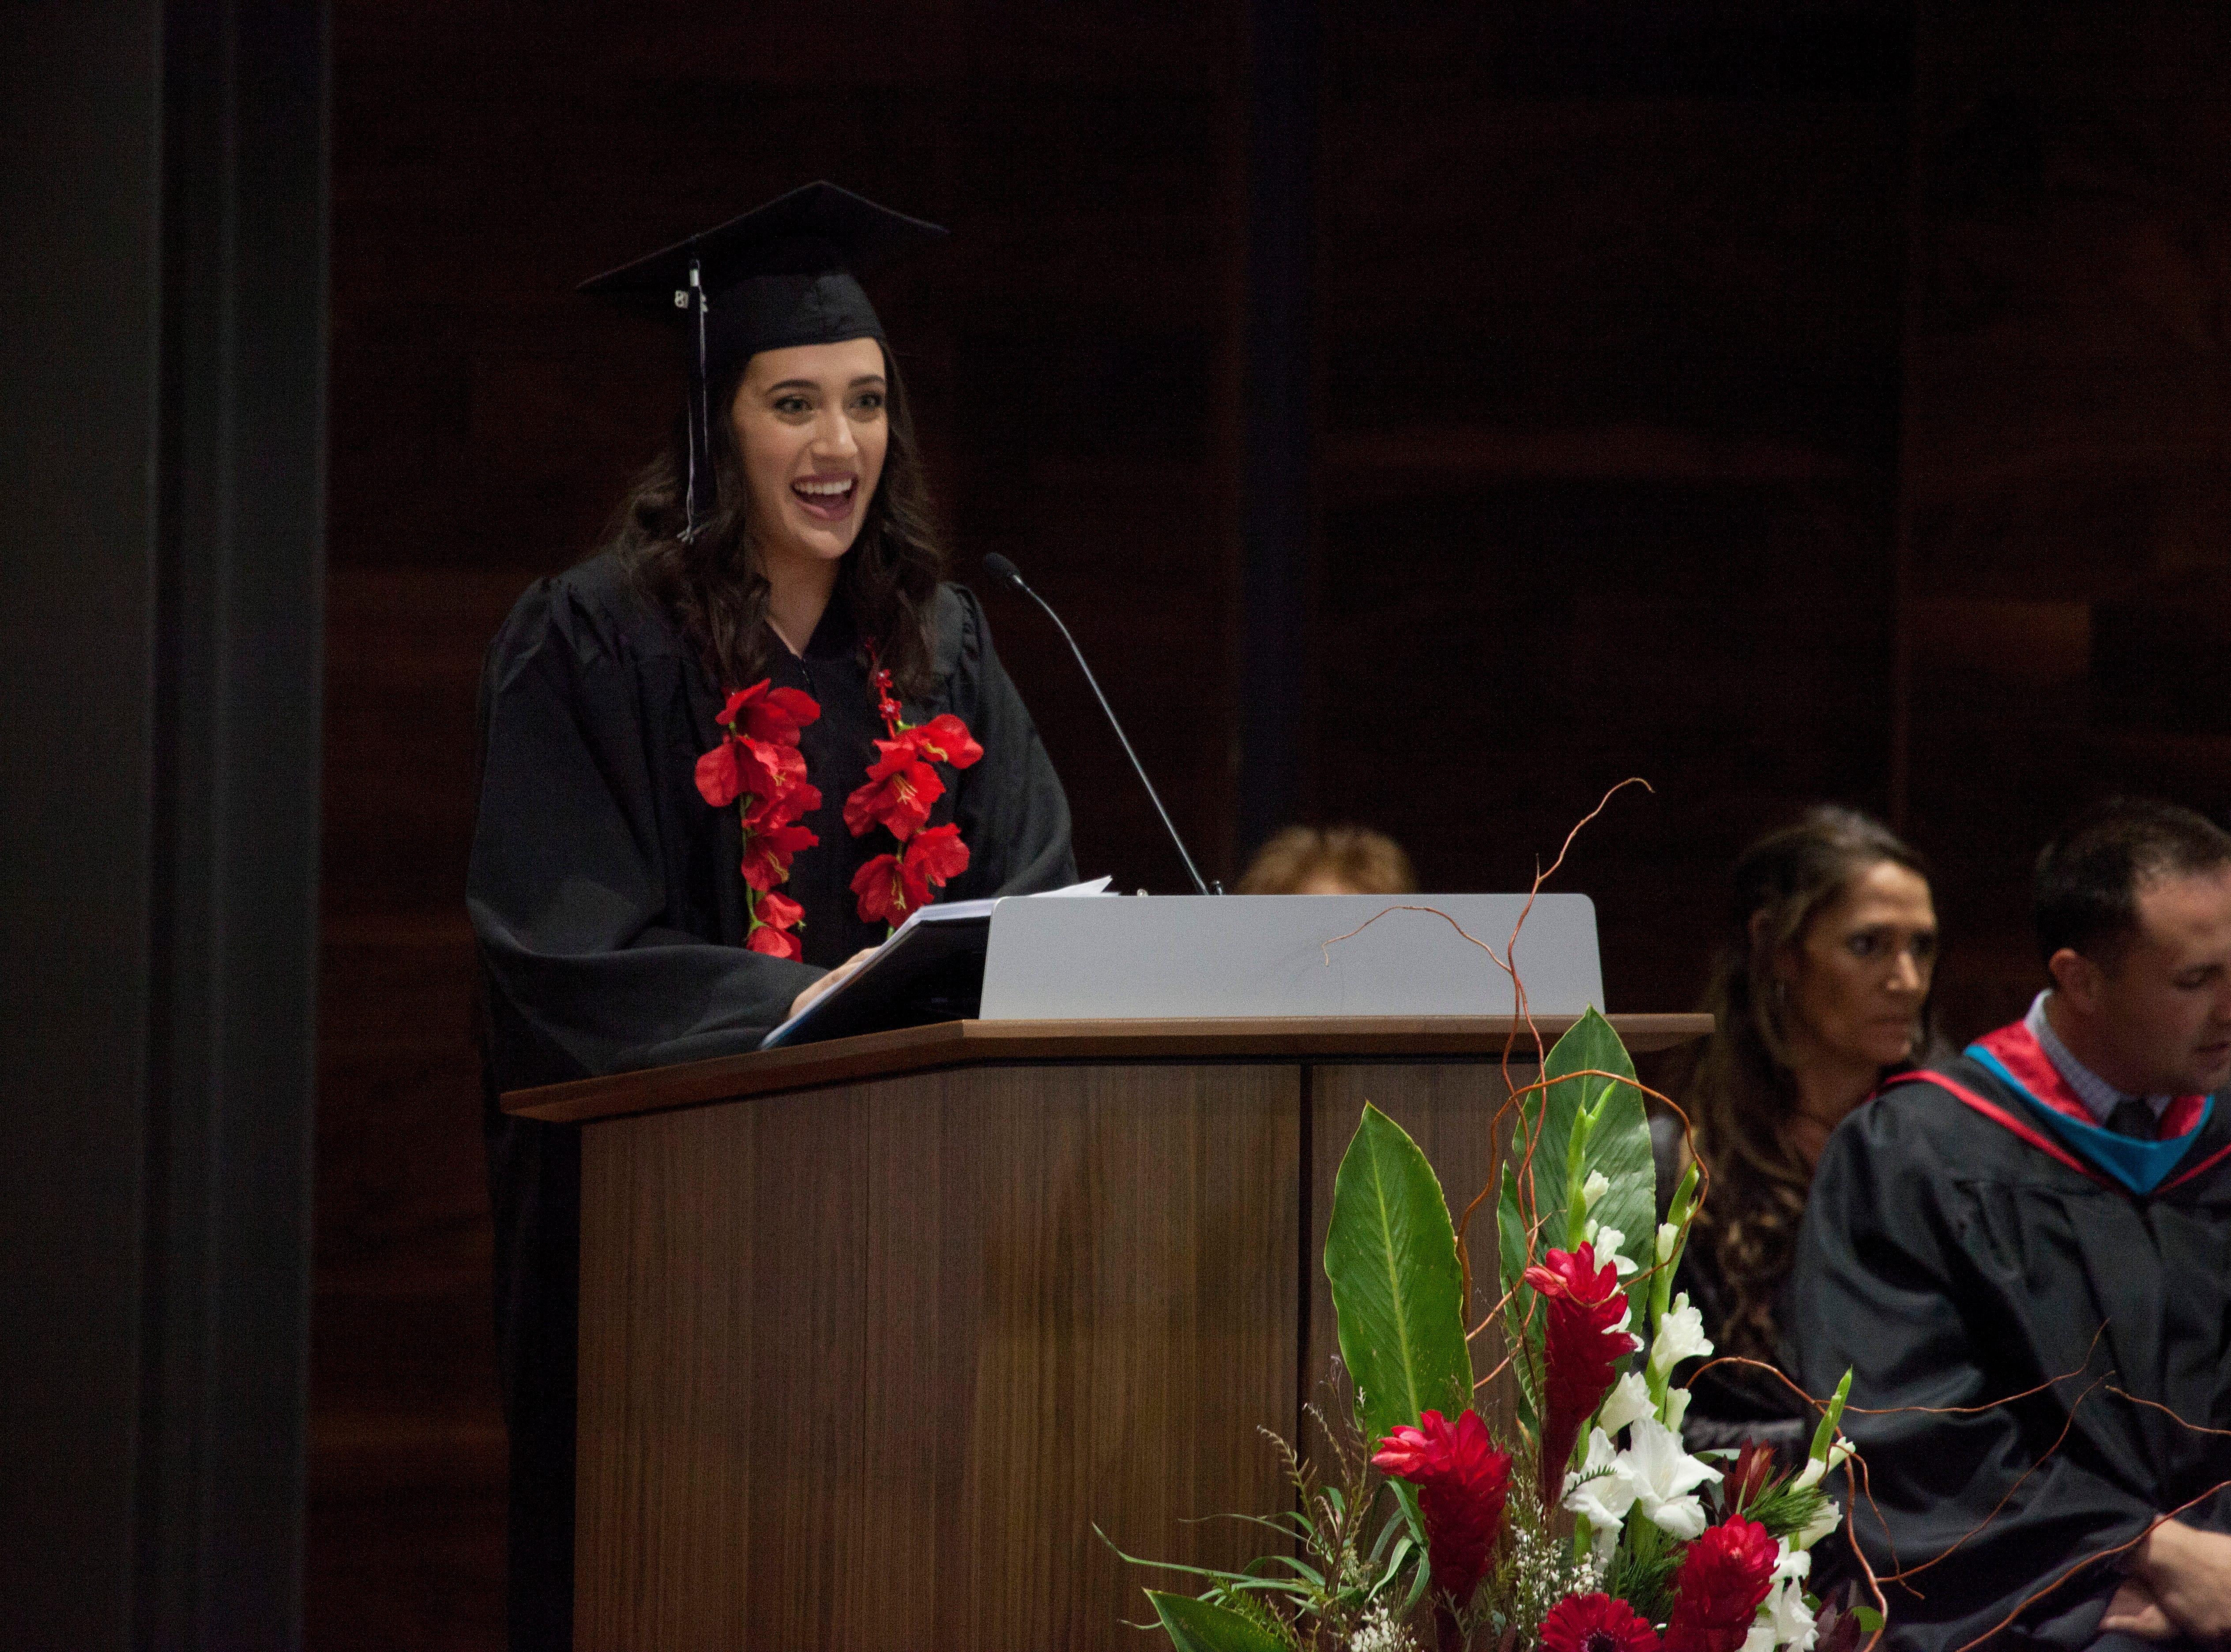 Dixie Technical College commemorates their 2018 graduating class Thursday, Dec. 13, 2018.